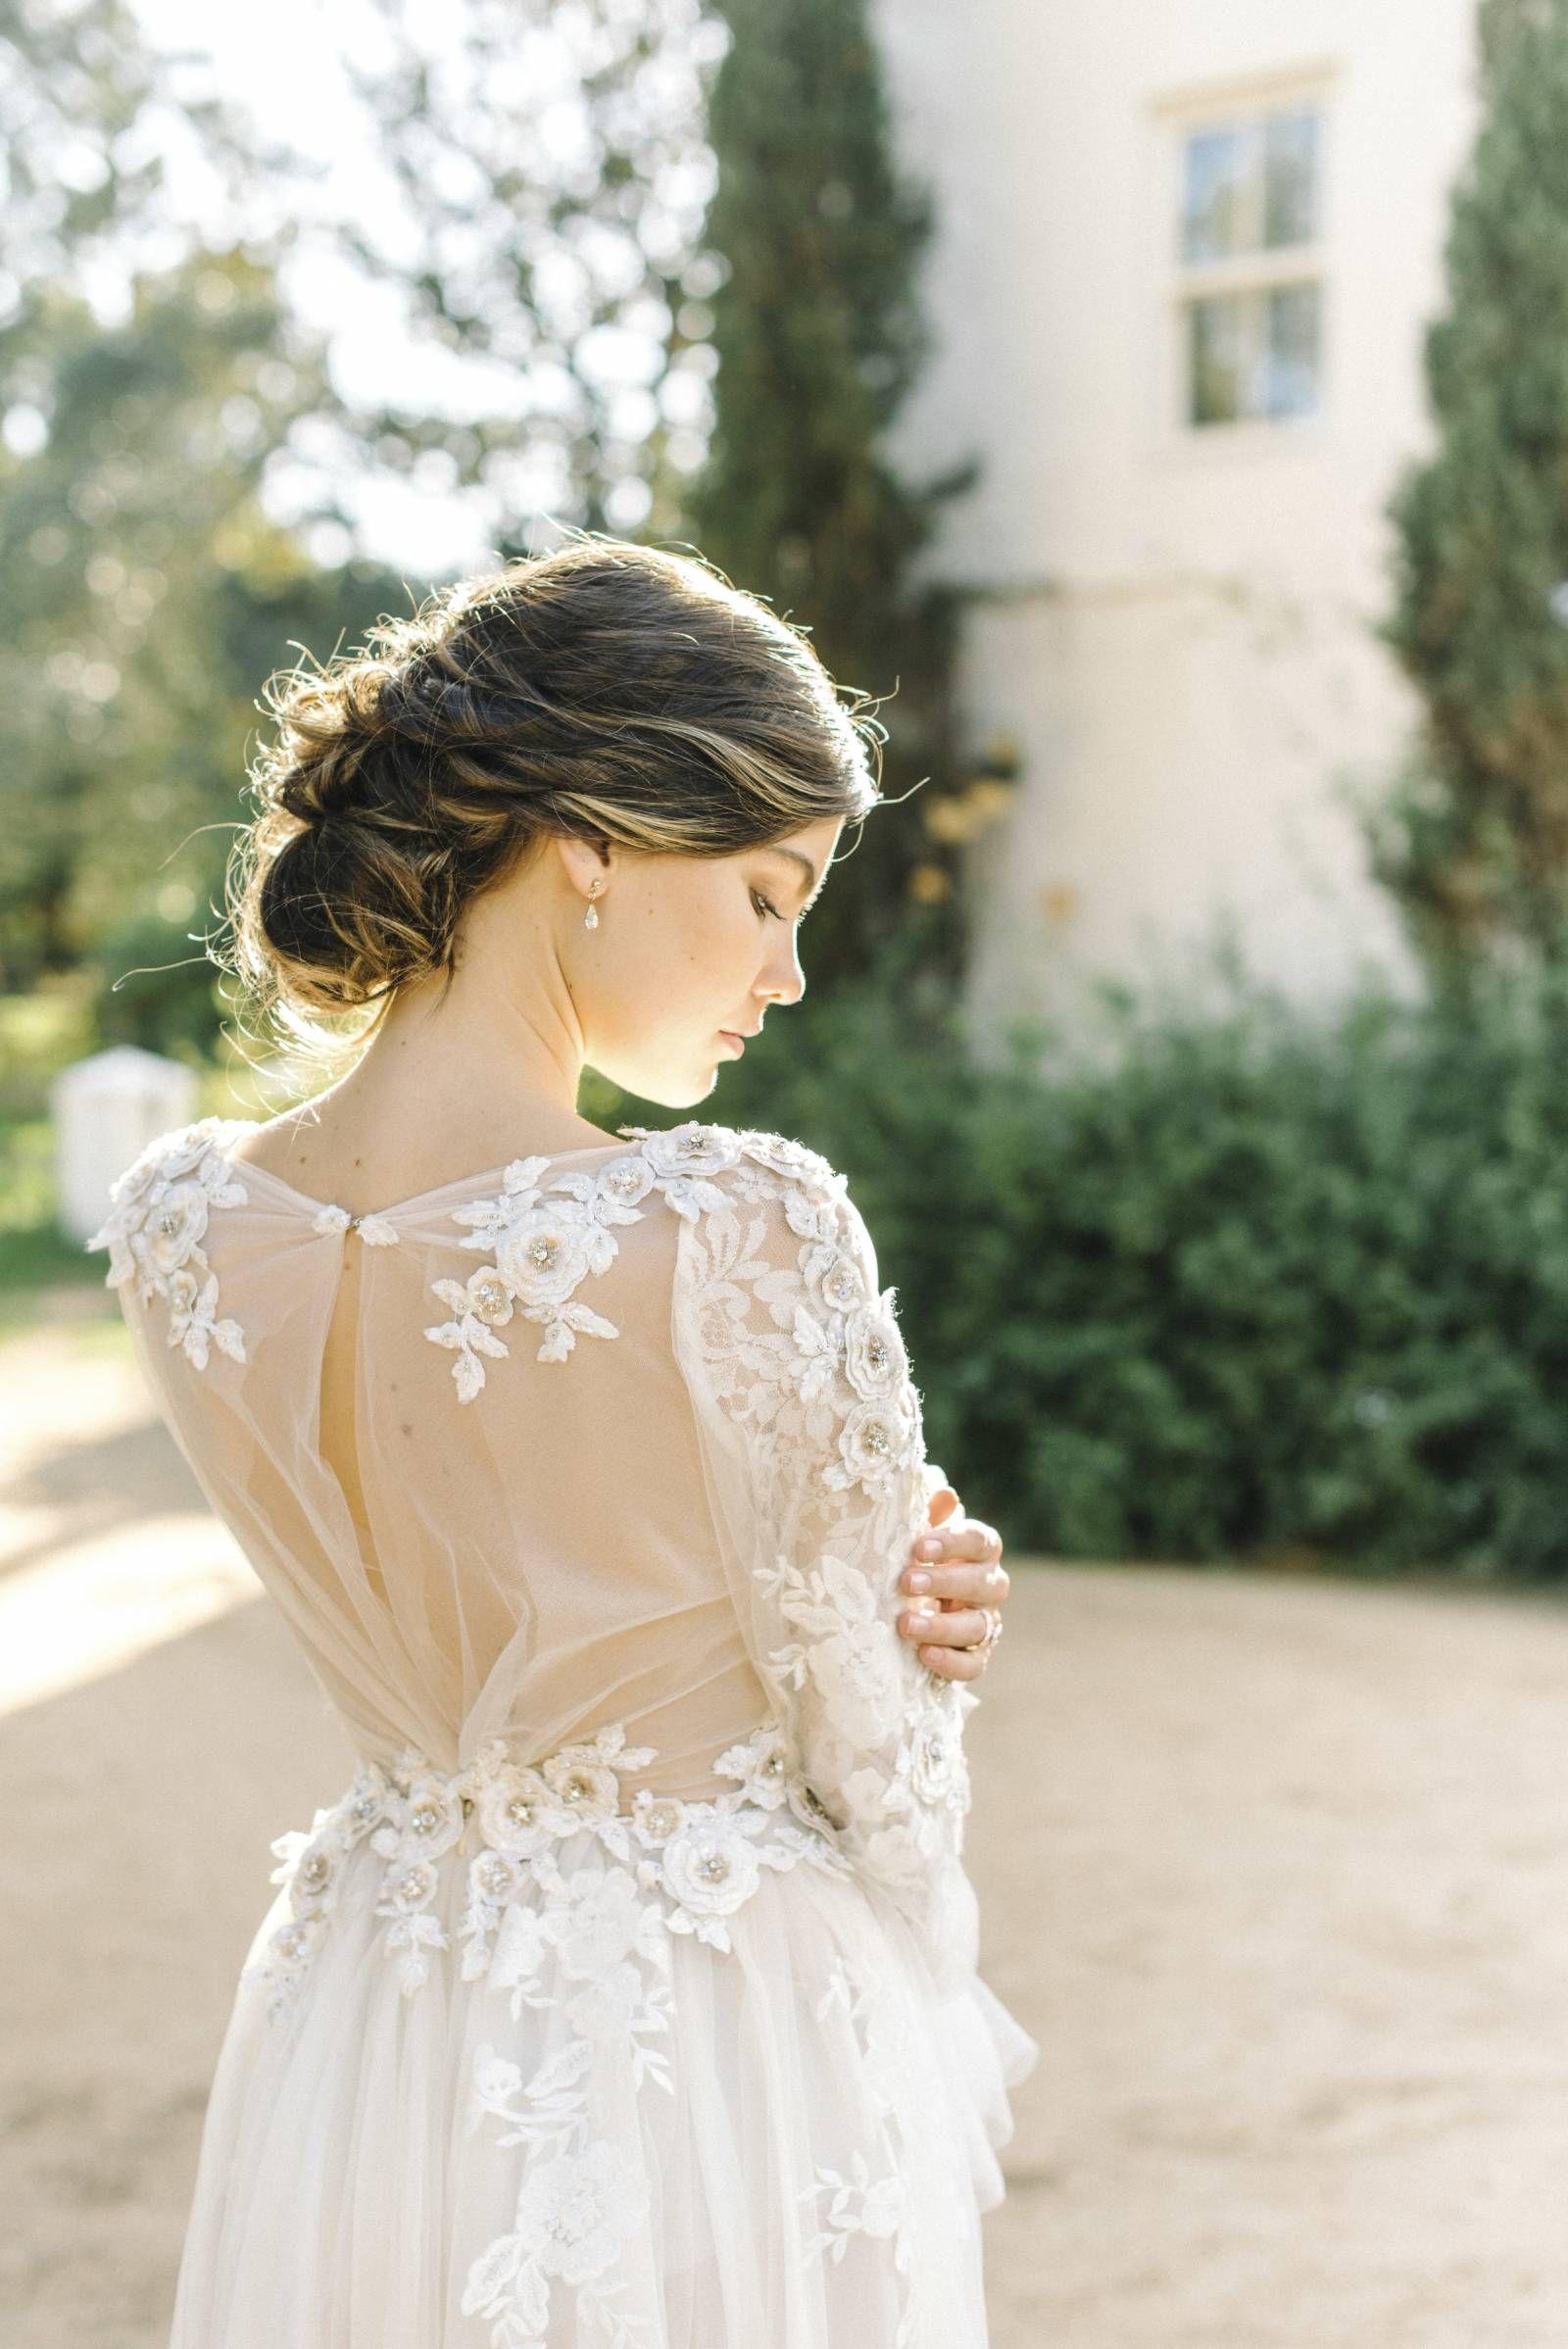 Old World Charm At A Cape Town Manor House Via Magnolia Rouge Wedding Dresses Unique Short Wedding Dress Wedding Gowns Lace [ 2397 x 1600 Pixel ]